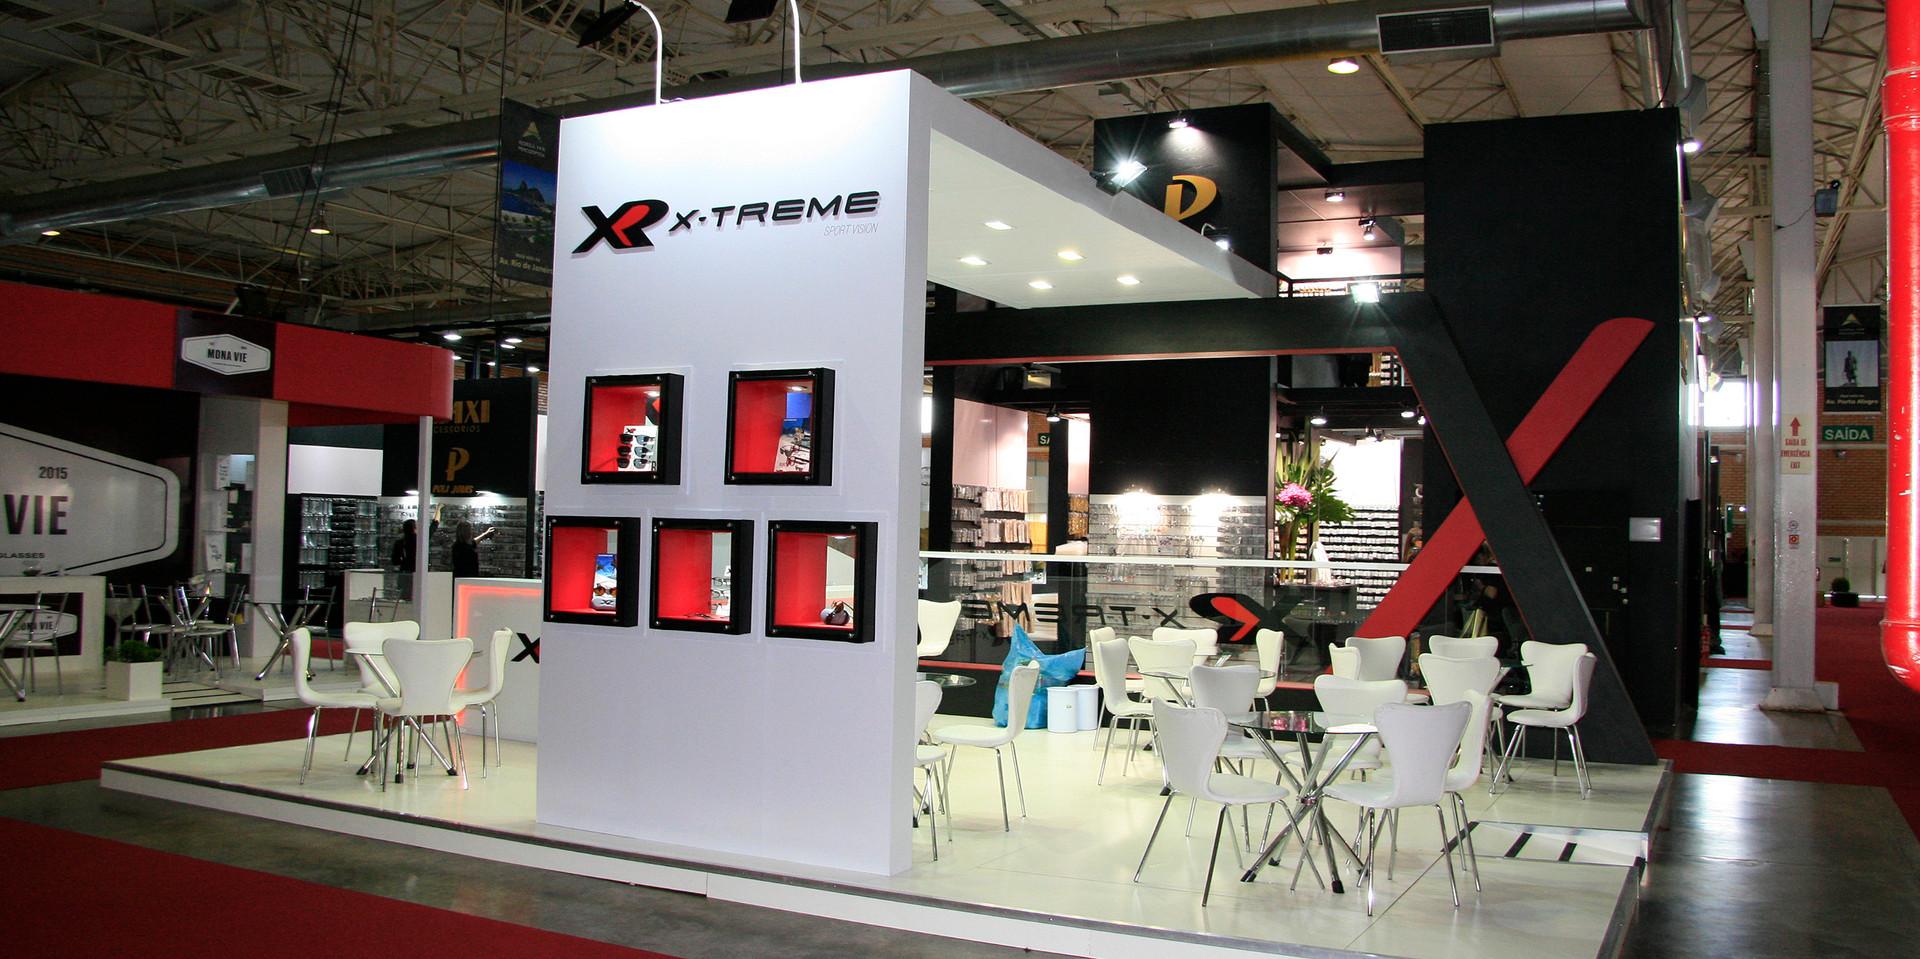 Xtreme (3).JPG